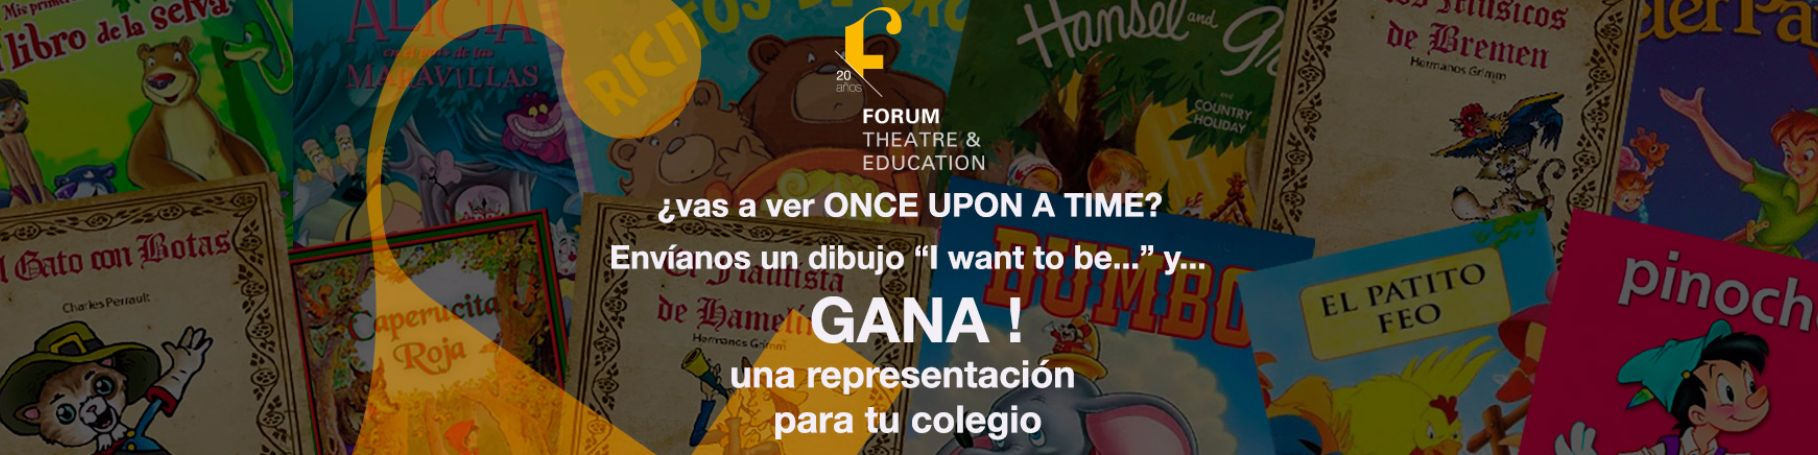 "Concurso de dibujos ""Once upon a time"""